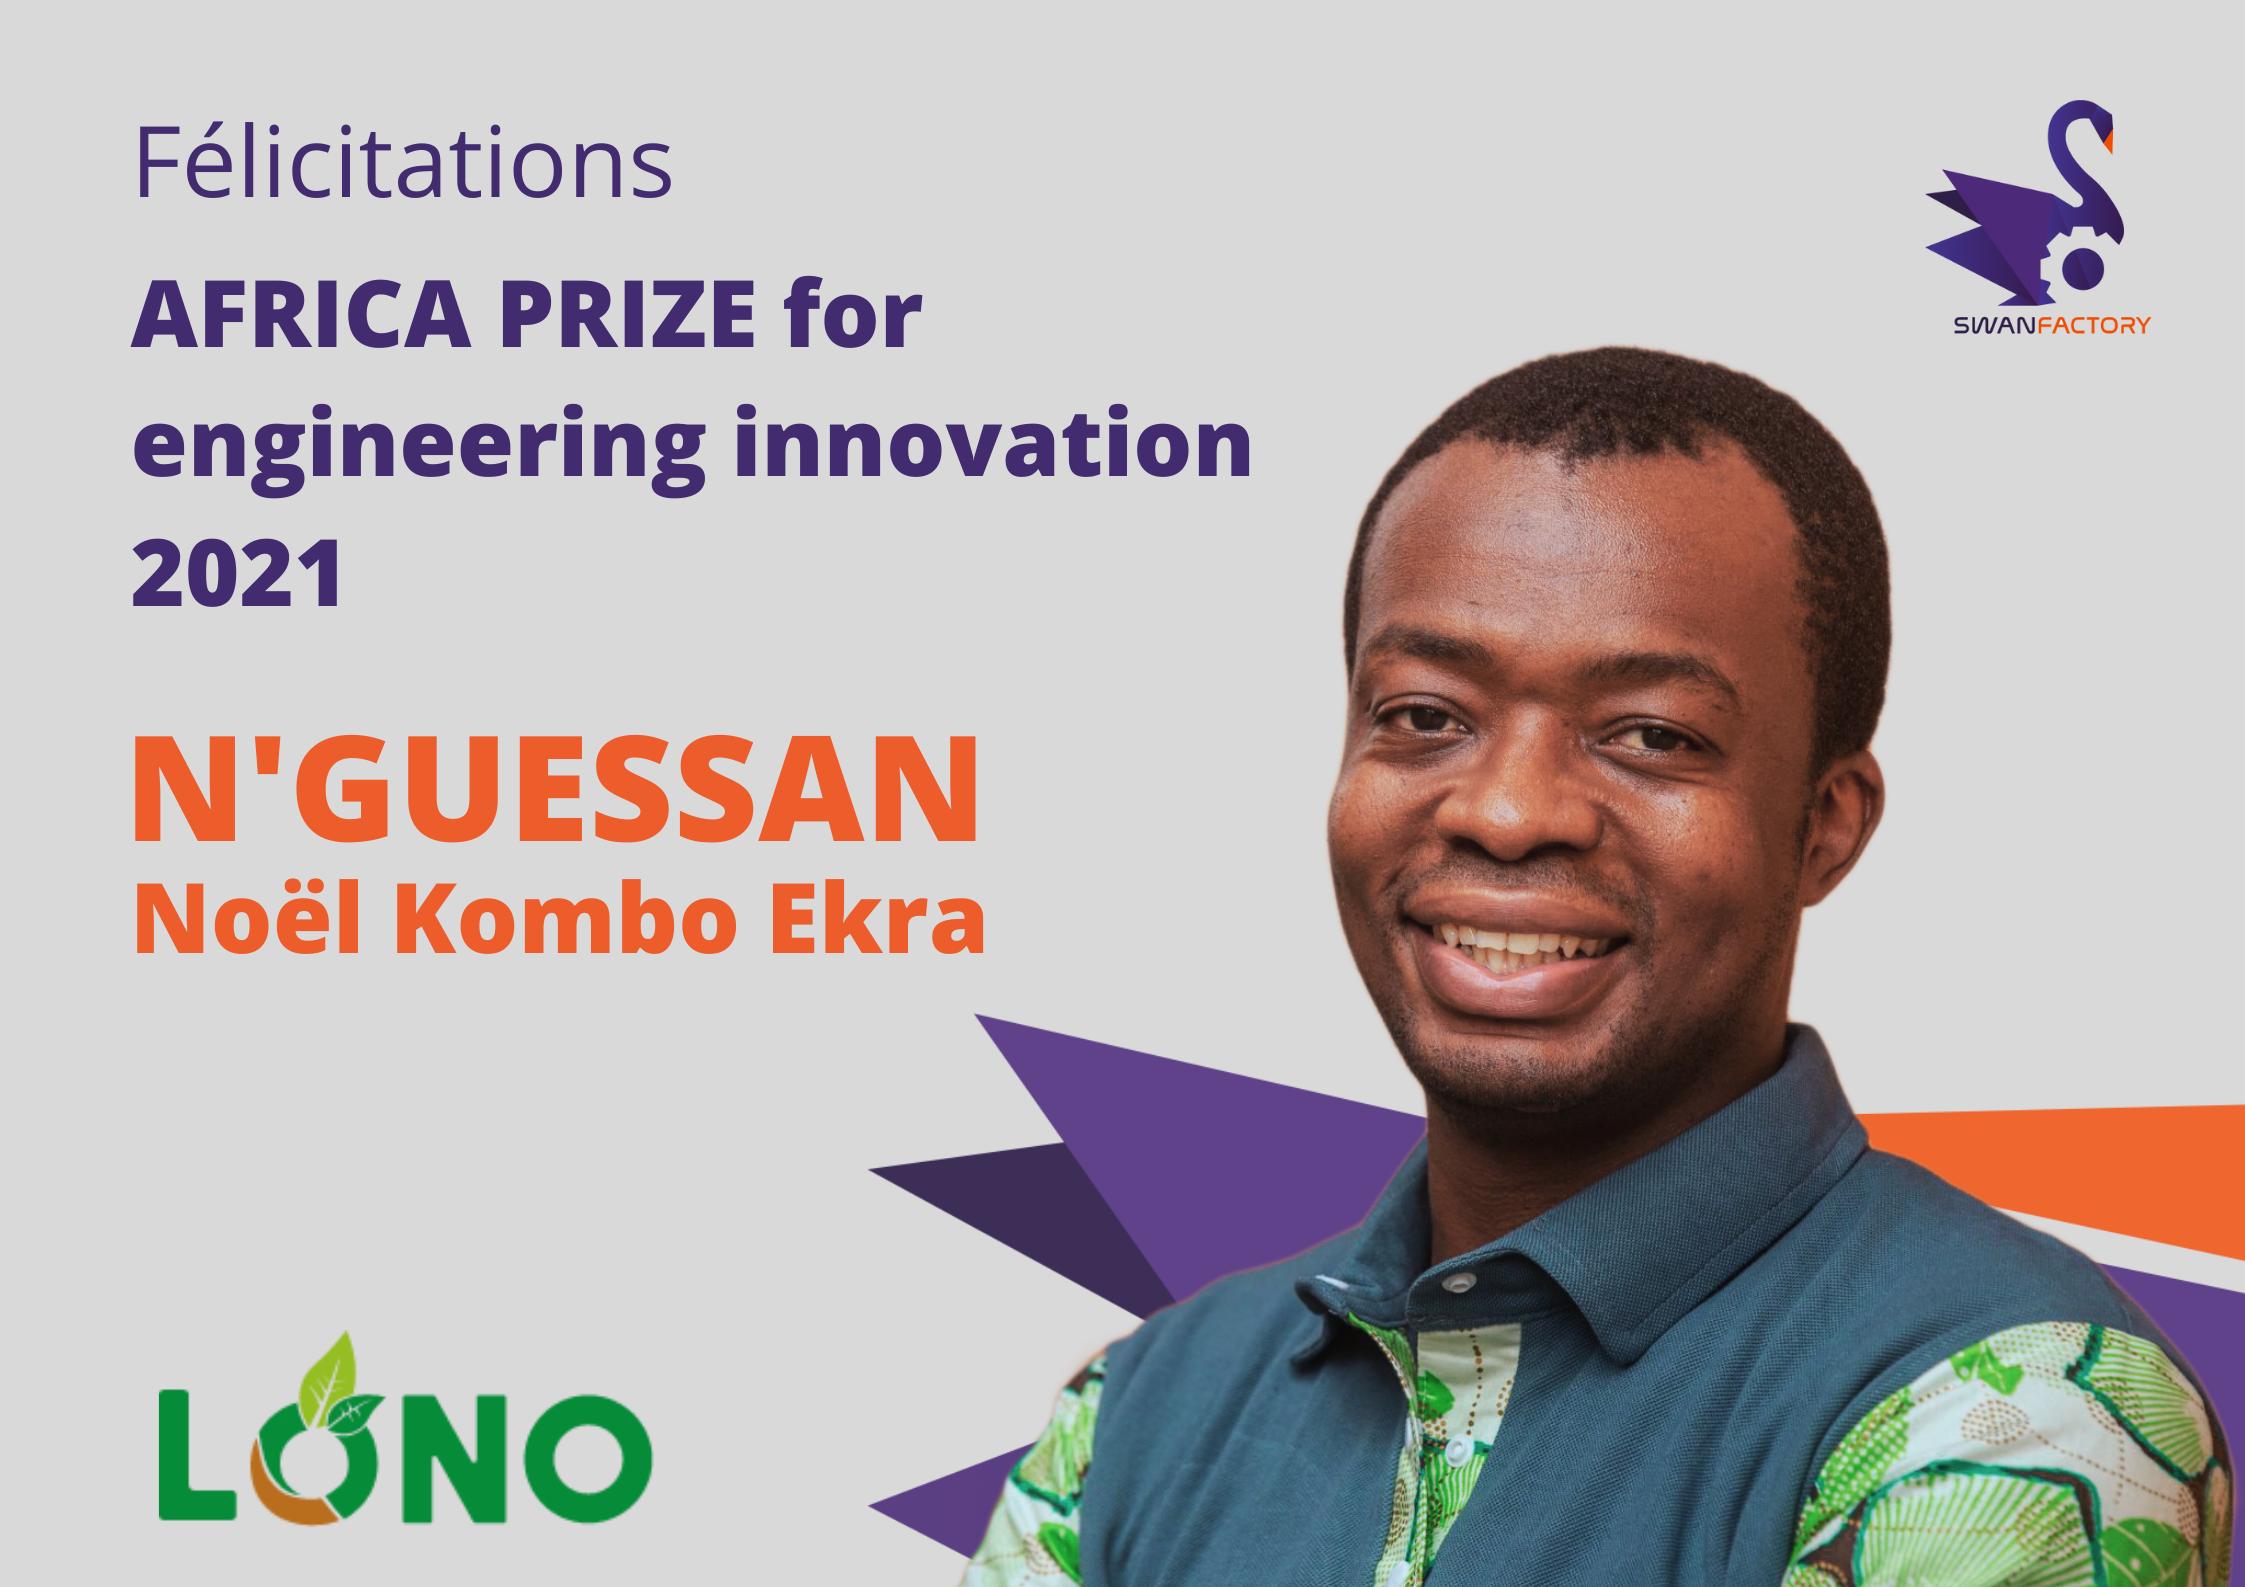 KUBEKO – Prix Afrique 2021 de la Royal Academy of Engineering